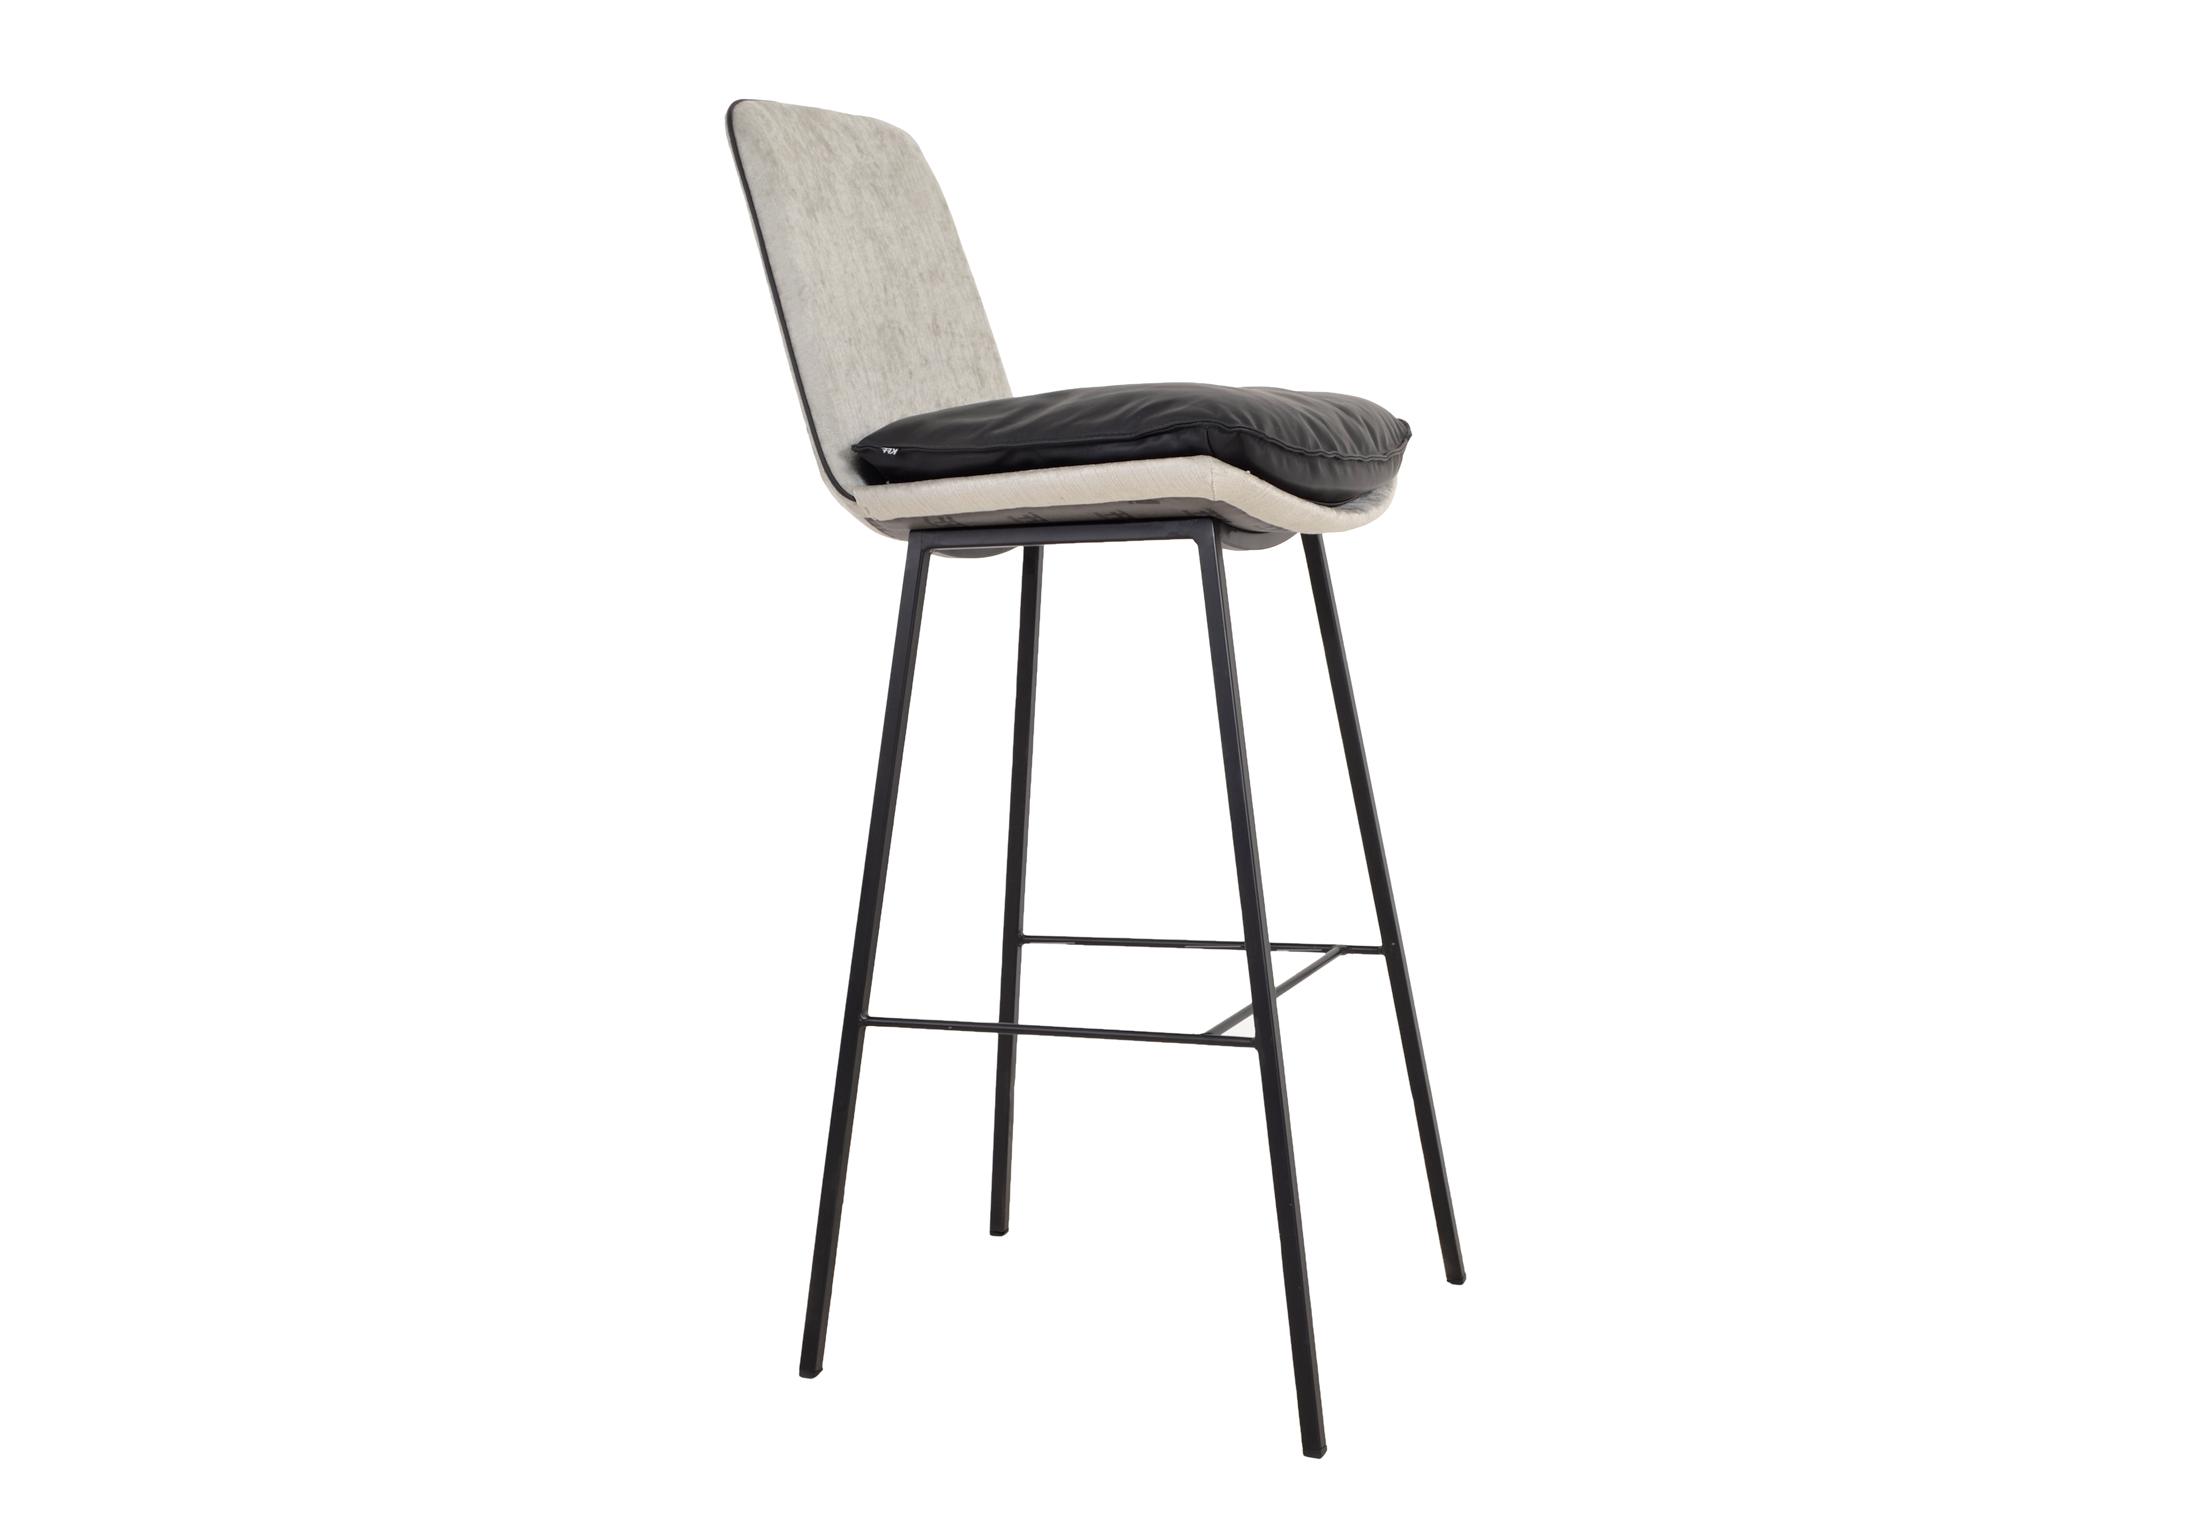 lhasa bar stool by kff stylepark. Black Bedroom Furniture Sets. Home Design Ideas